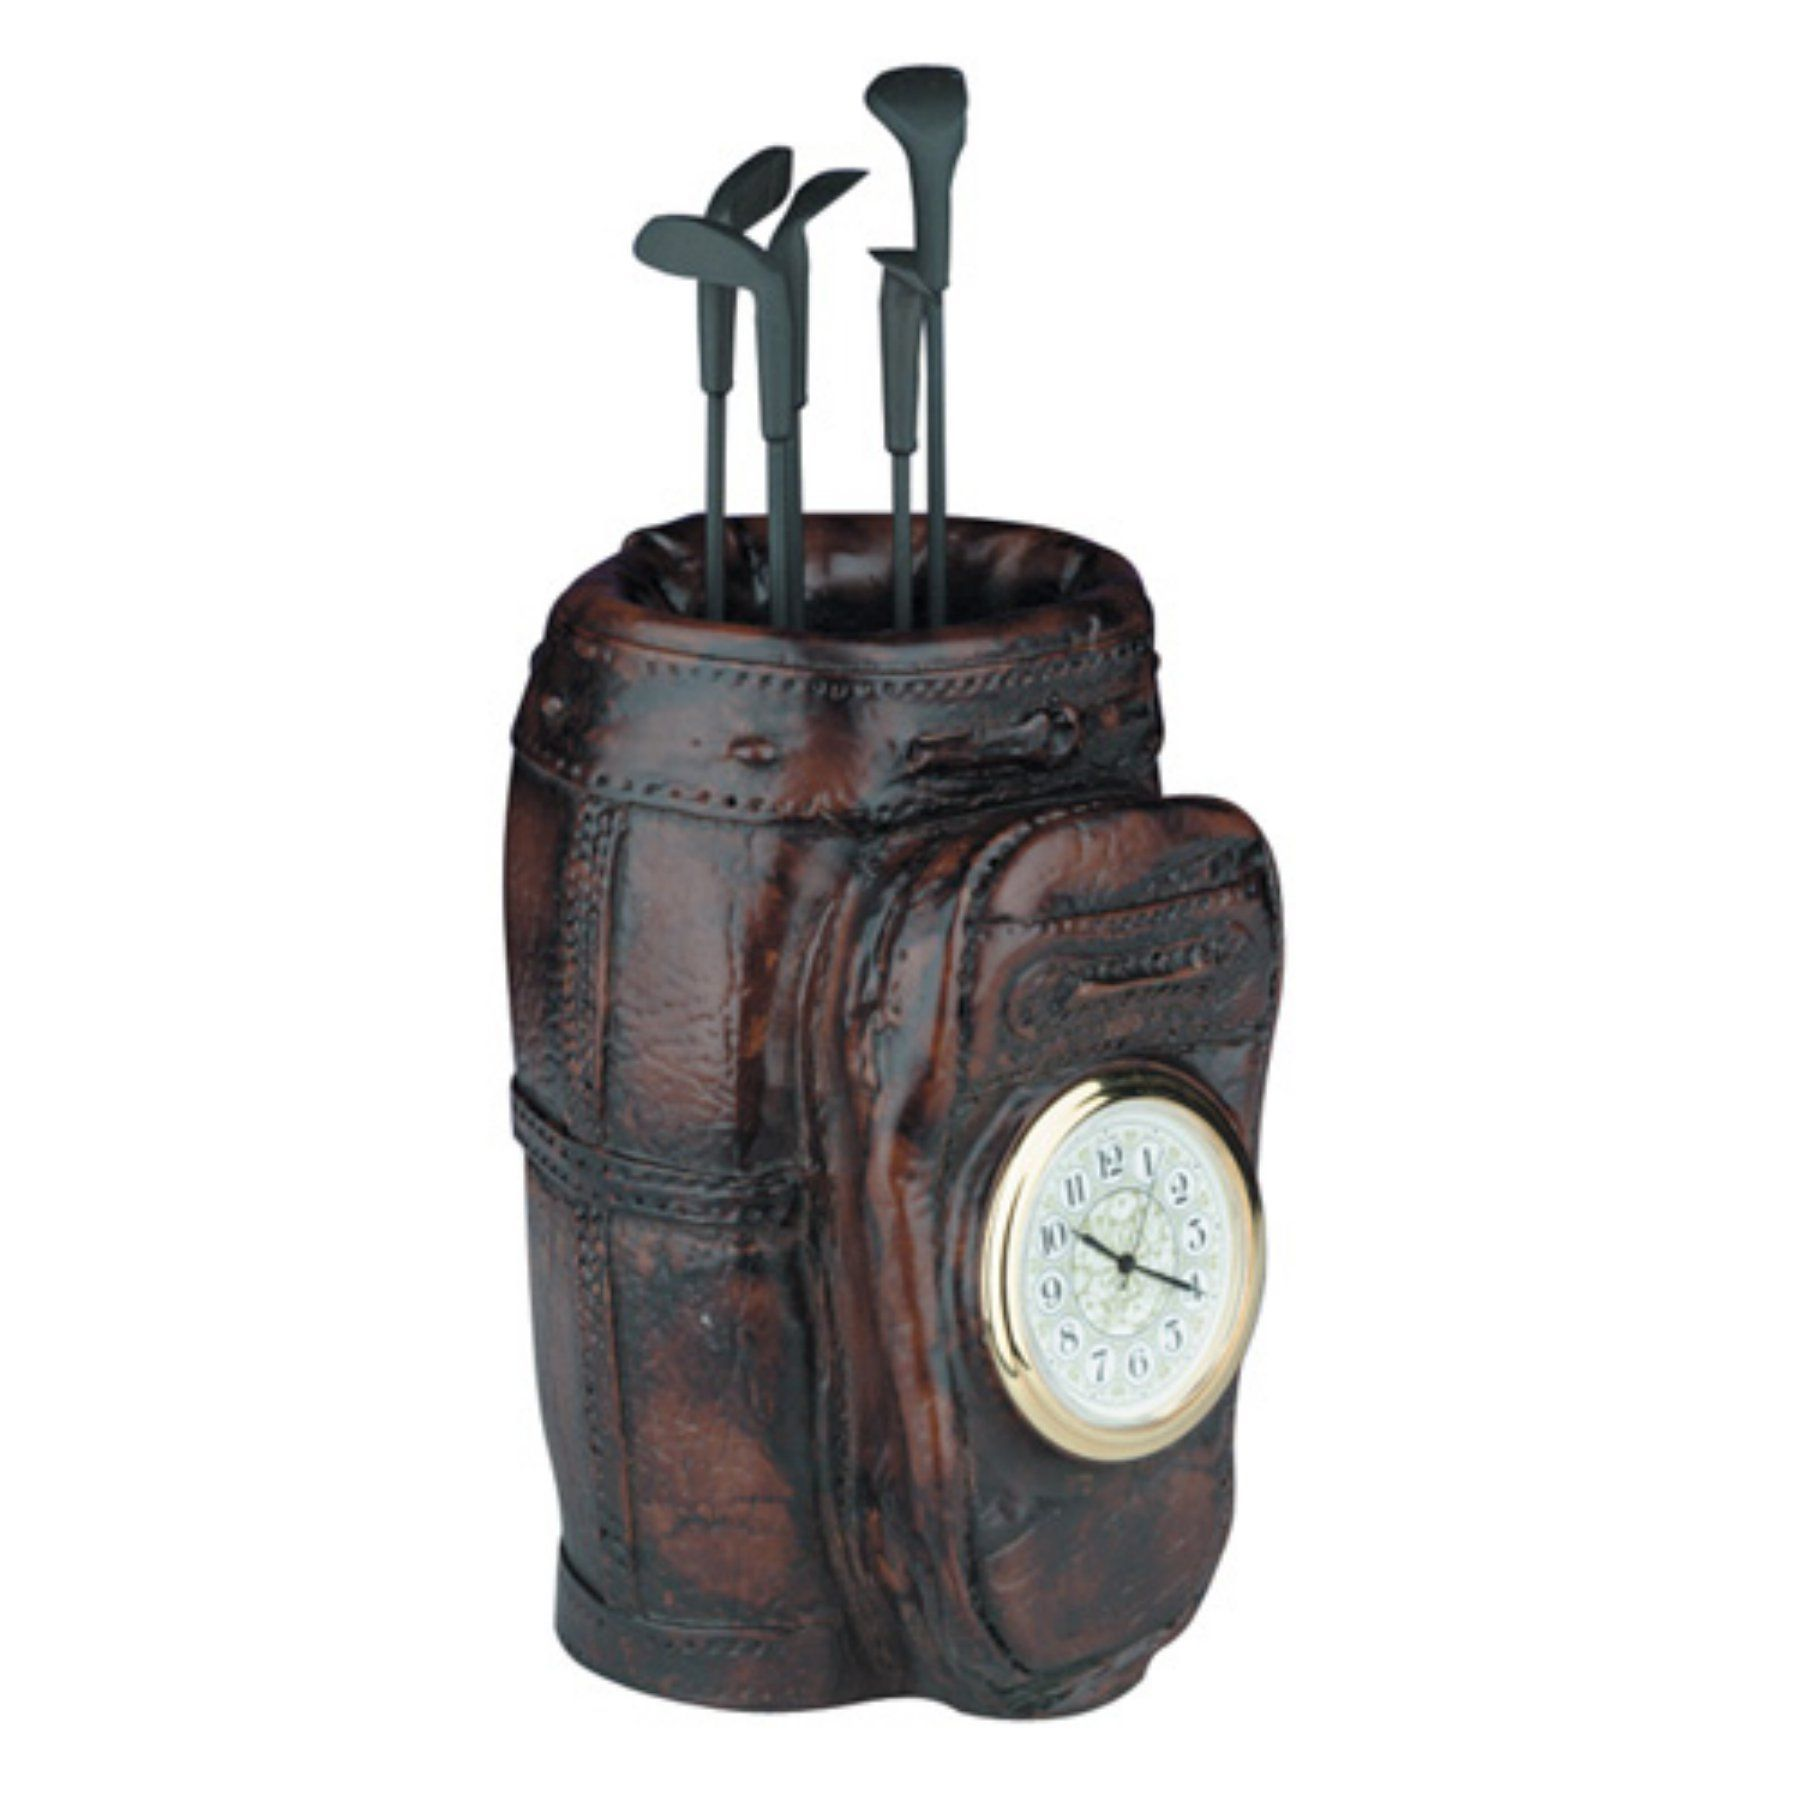 Golf Bag Desktop Clock with Clubs - 0317-C-BW